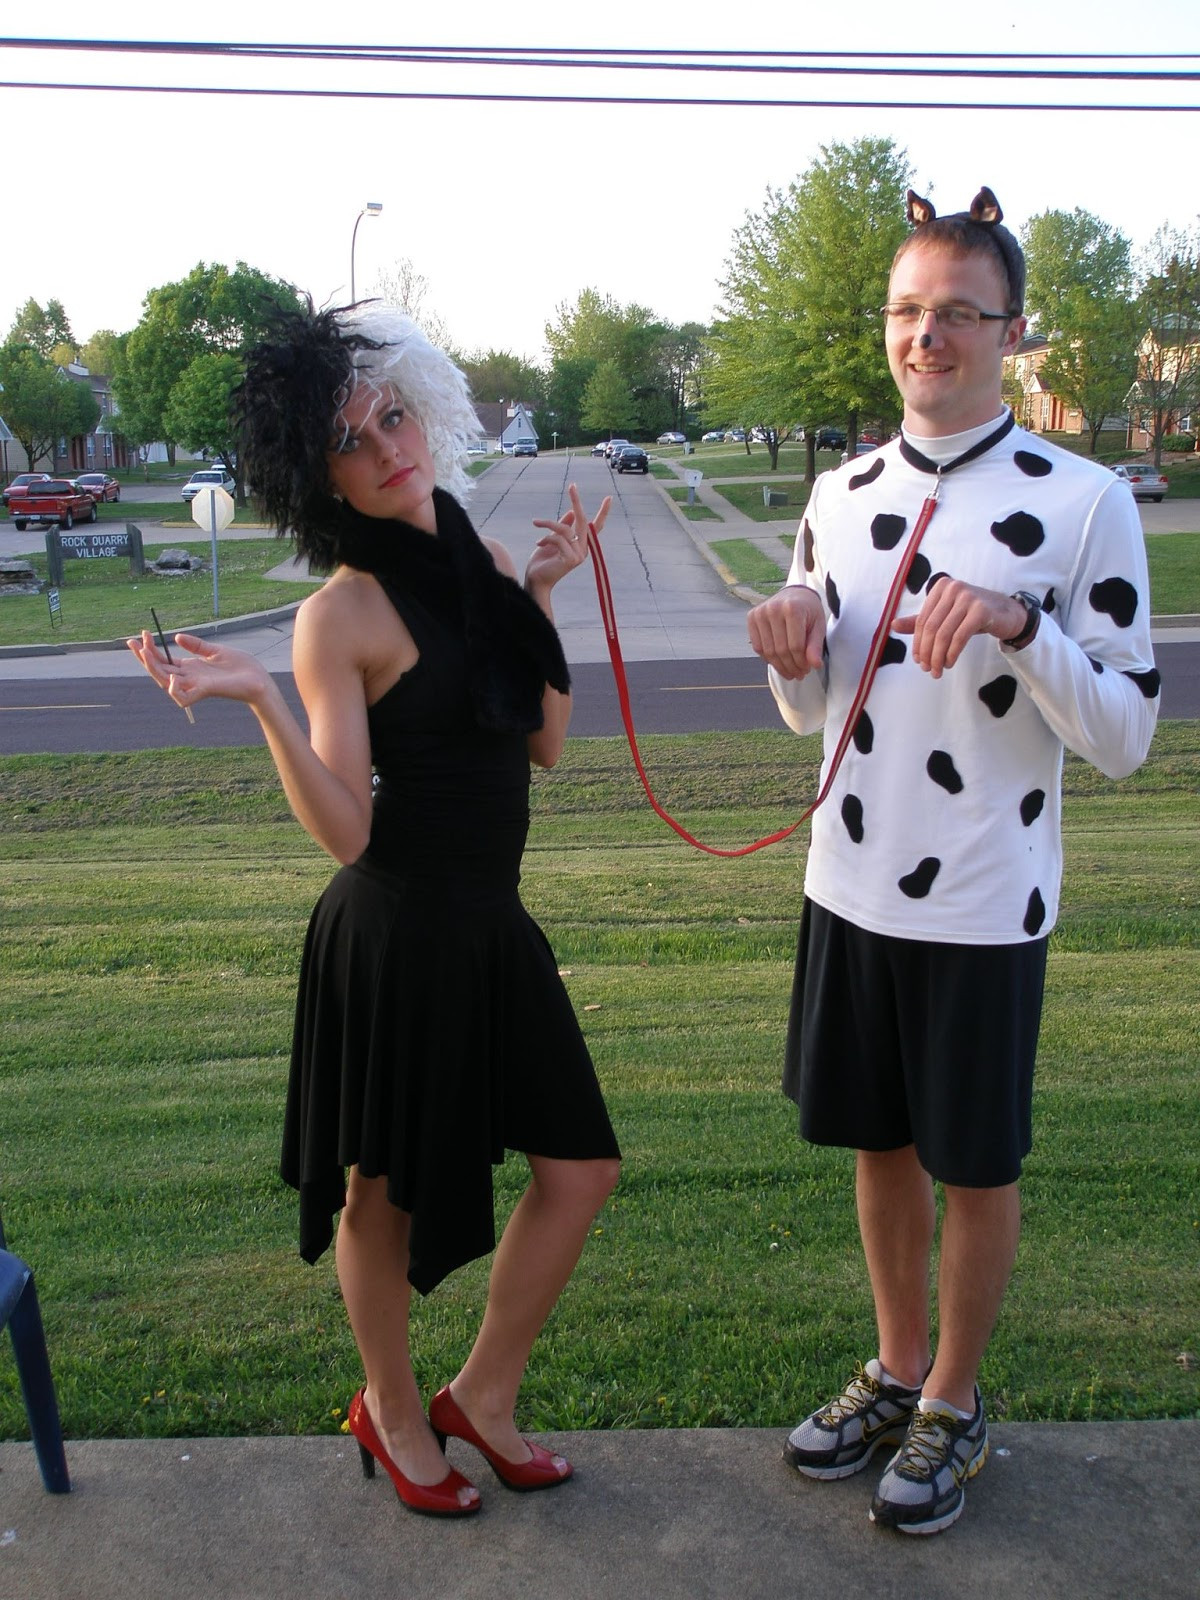 DIY Costume For Couples  Katie in Kansas DIY Couples Halloween Costume Ideas